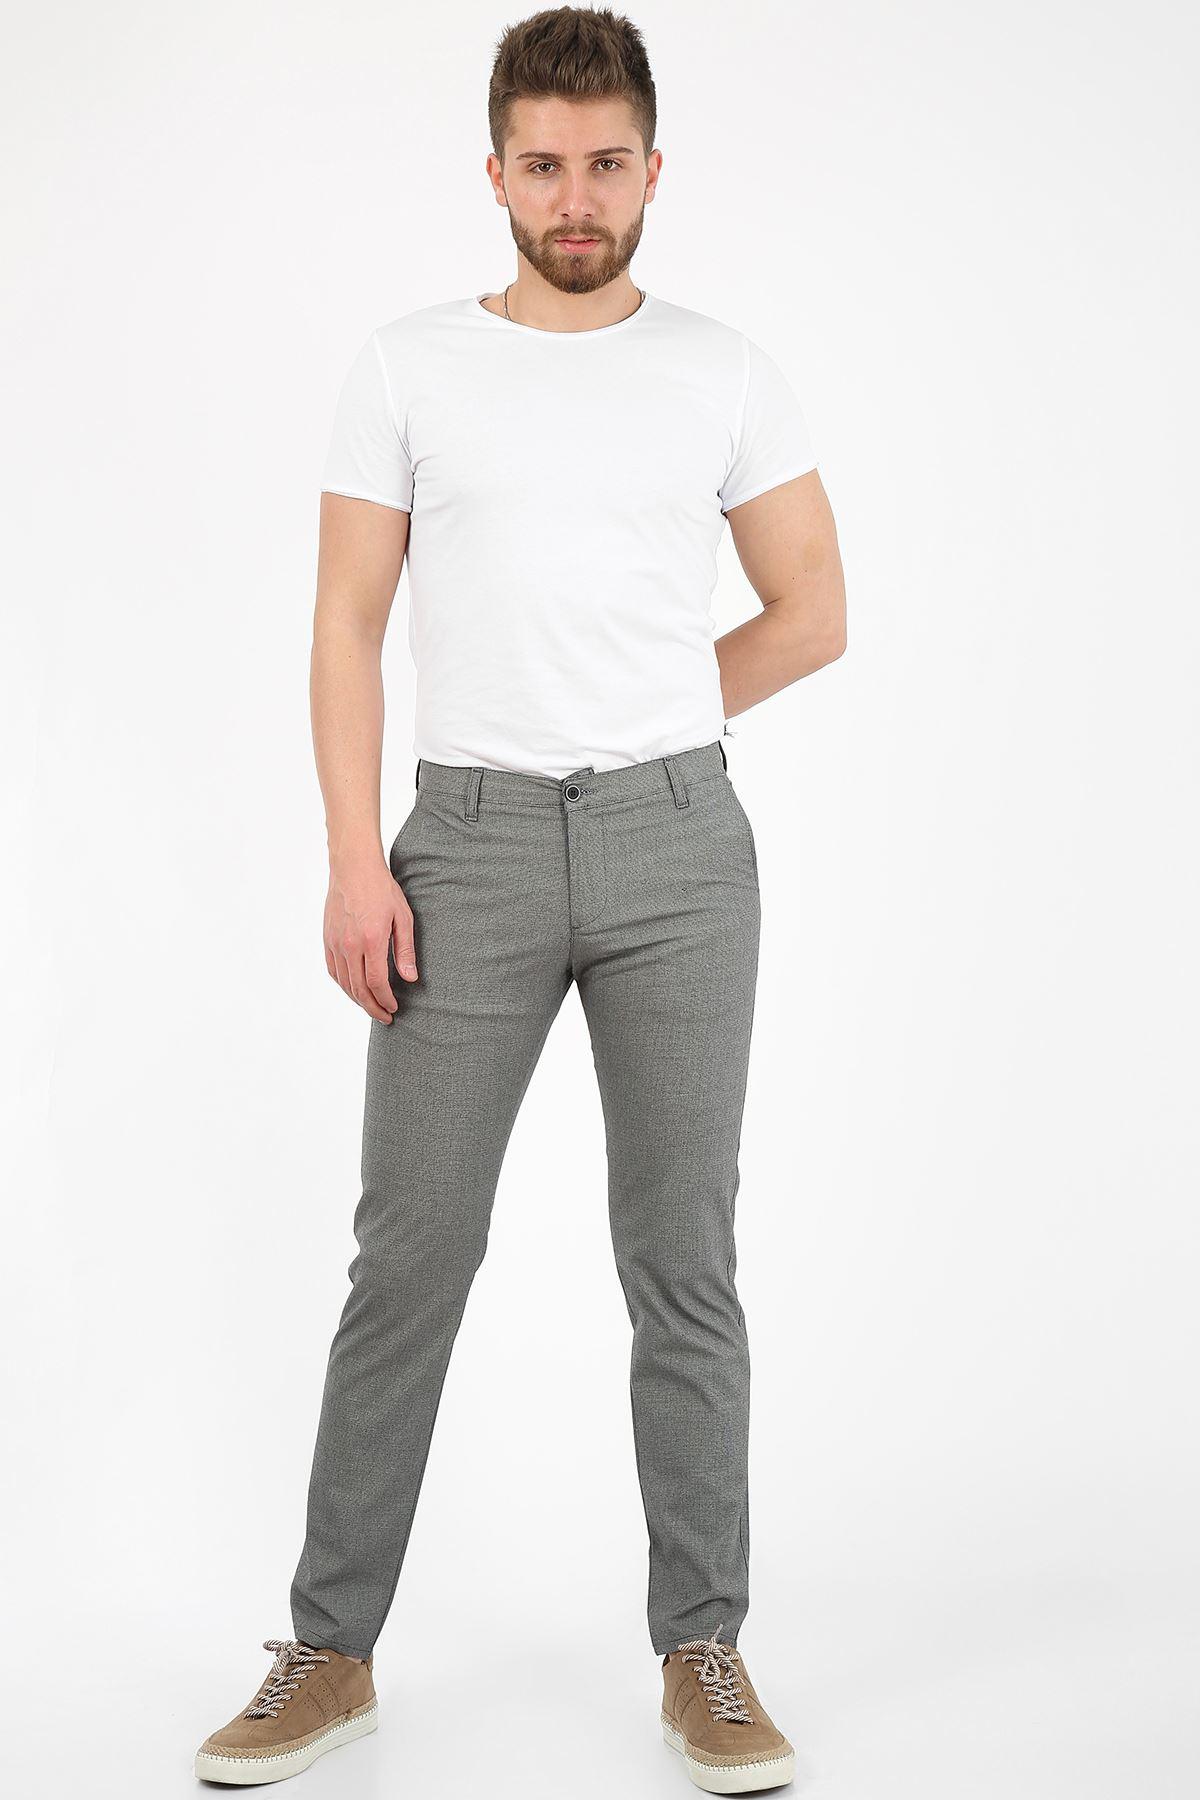 Siyah Slim Fit Erkek Chino Pantolon -OLİVER